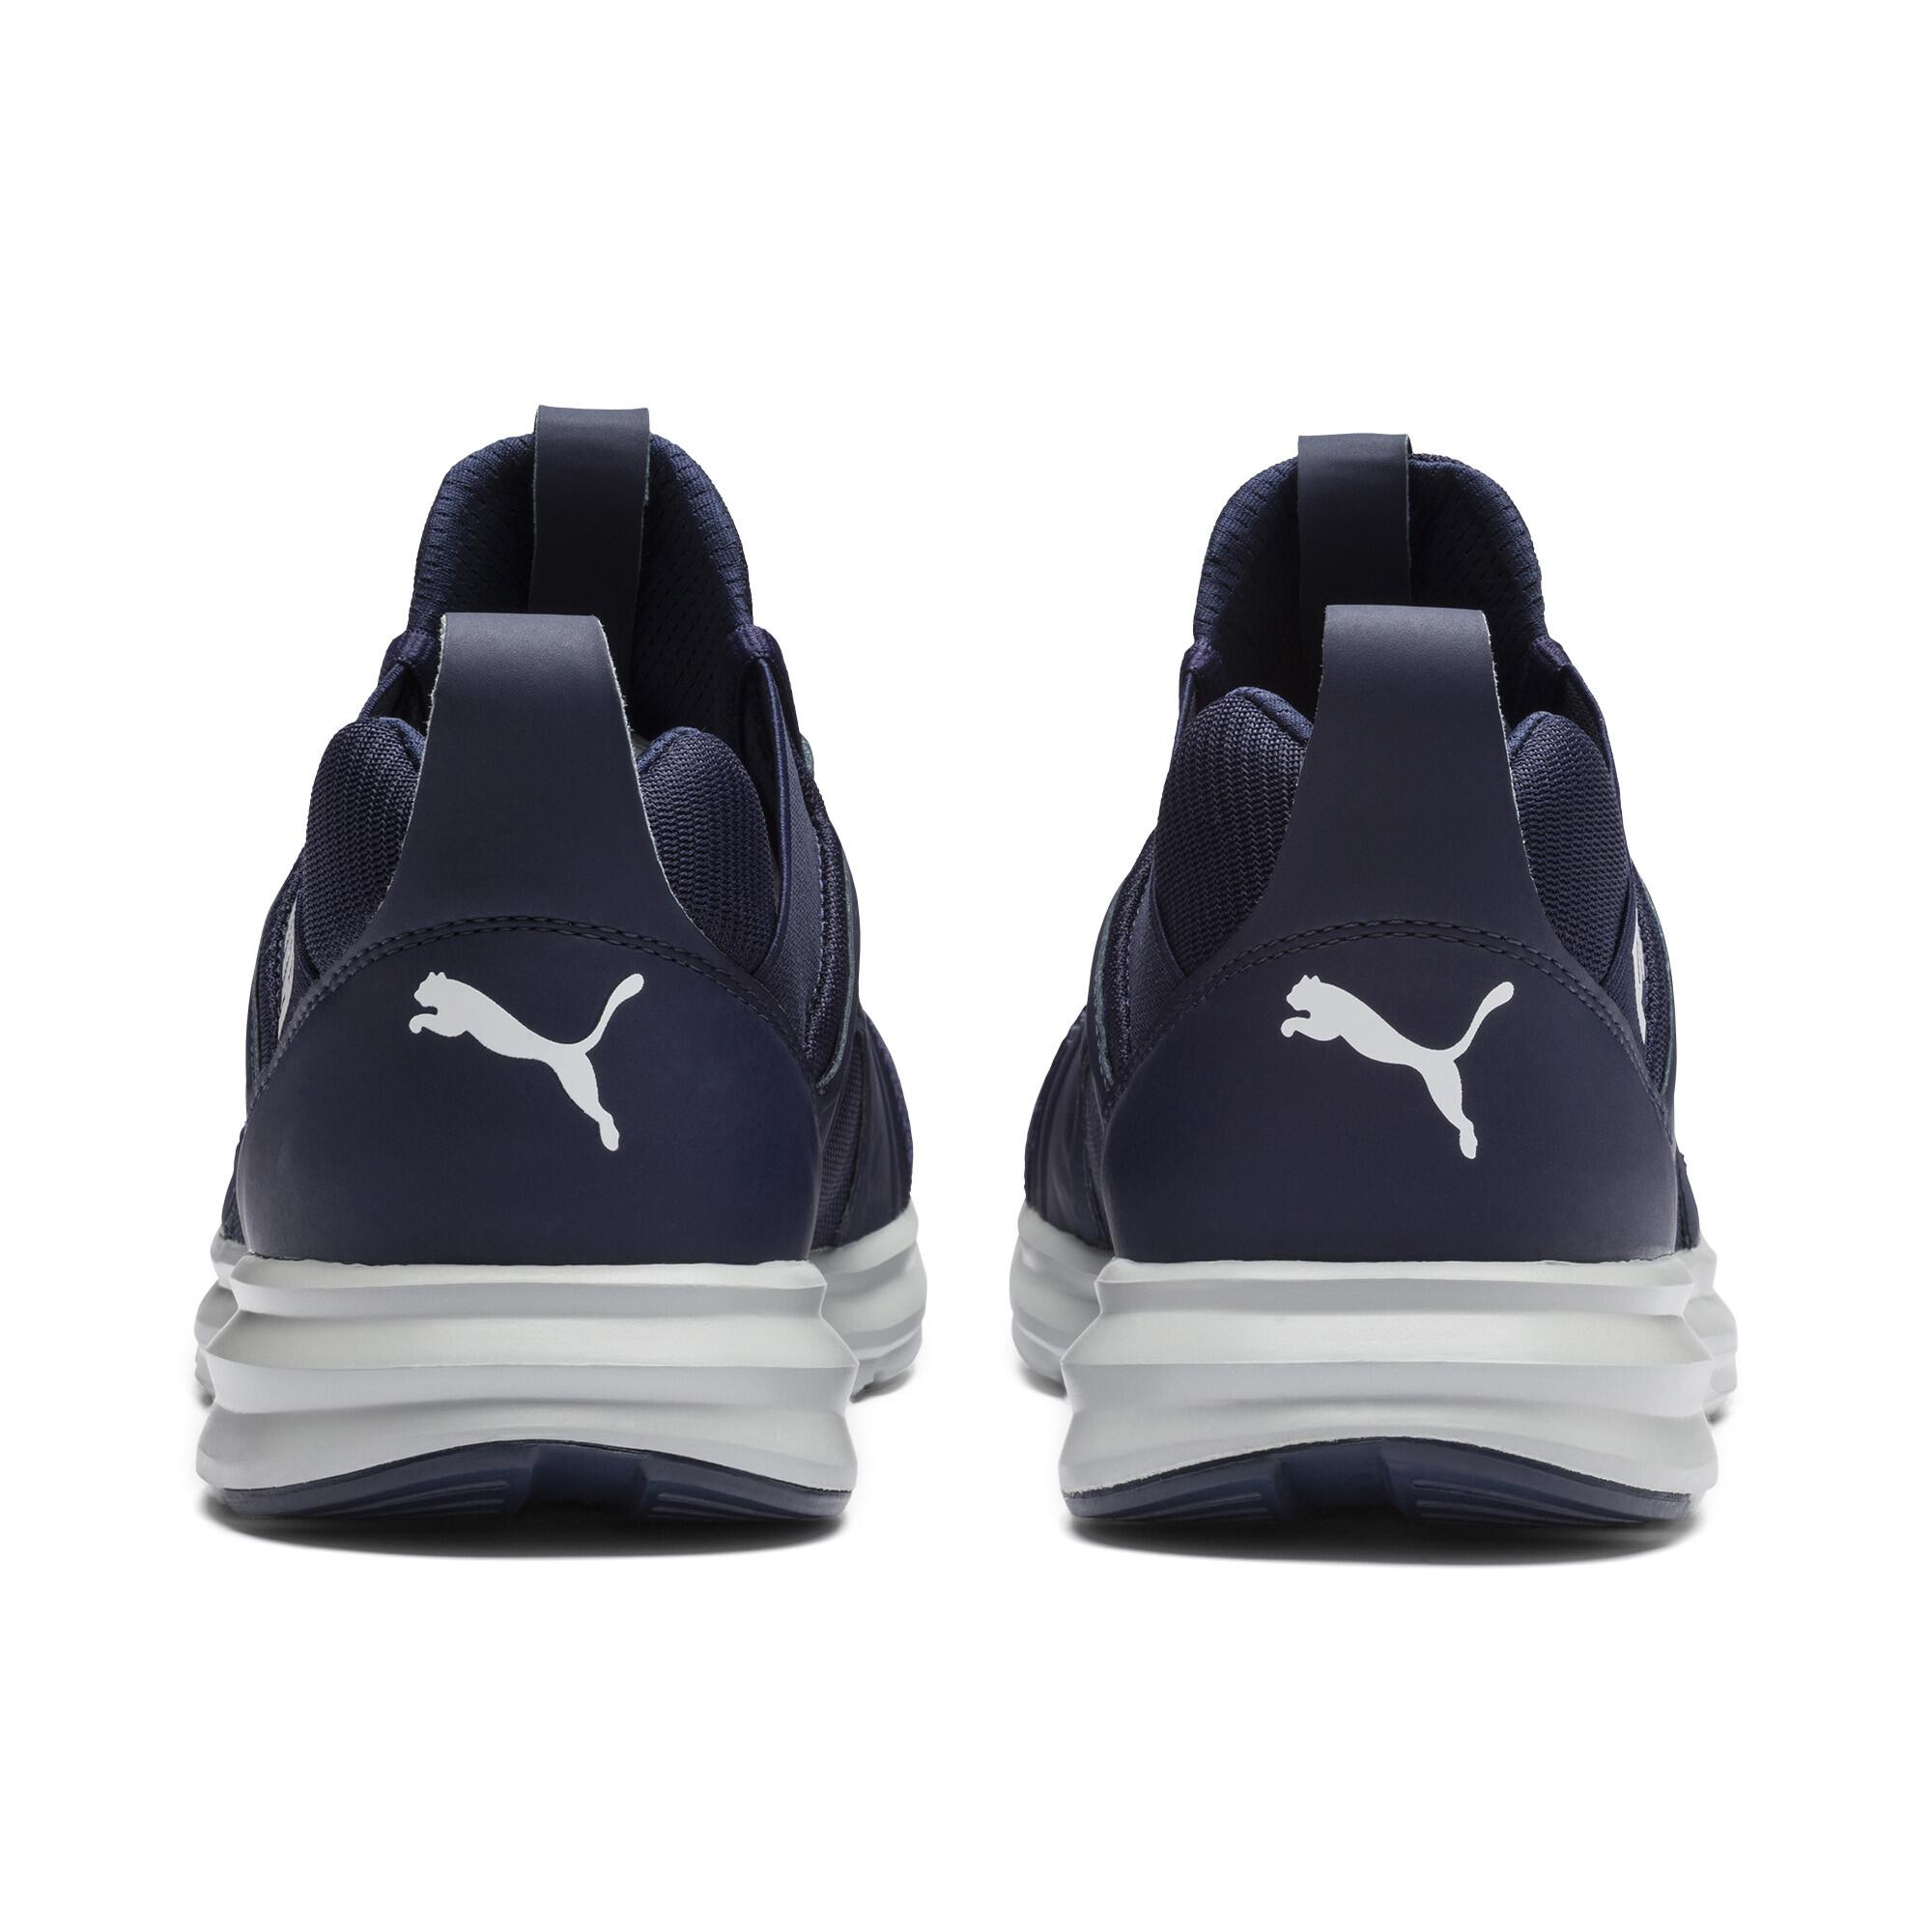 PUMA-Enzo-Geo-Men-s-Sneakers-Men-Shoe-Running thumbnail 3